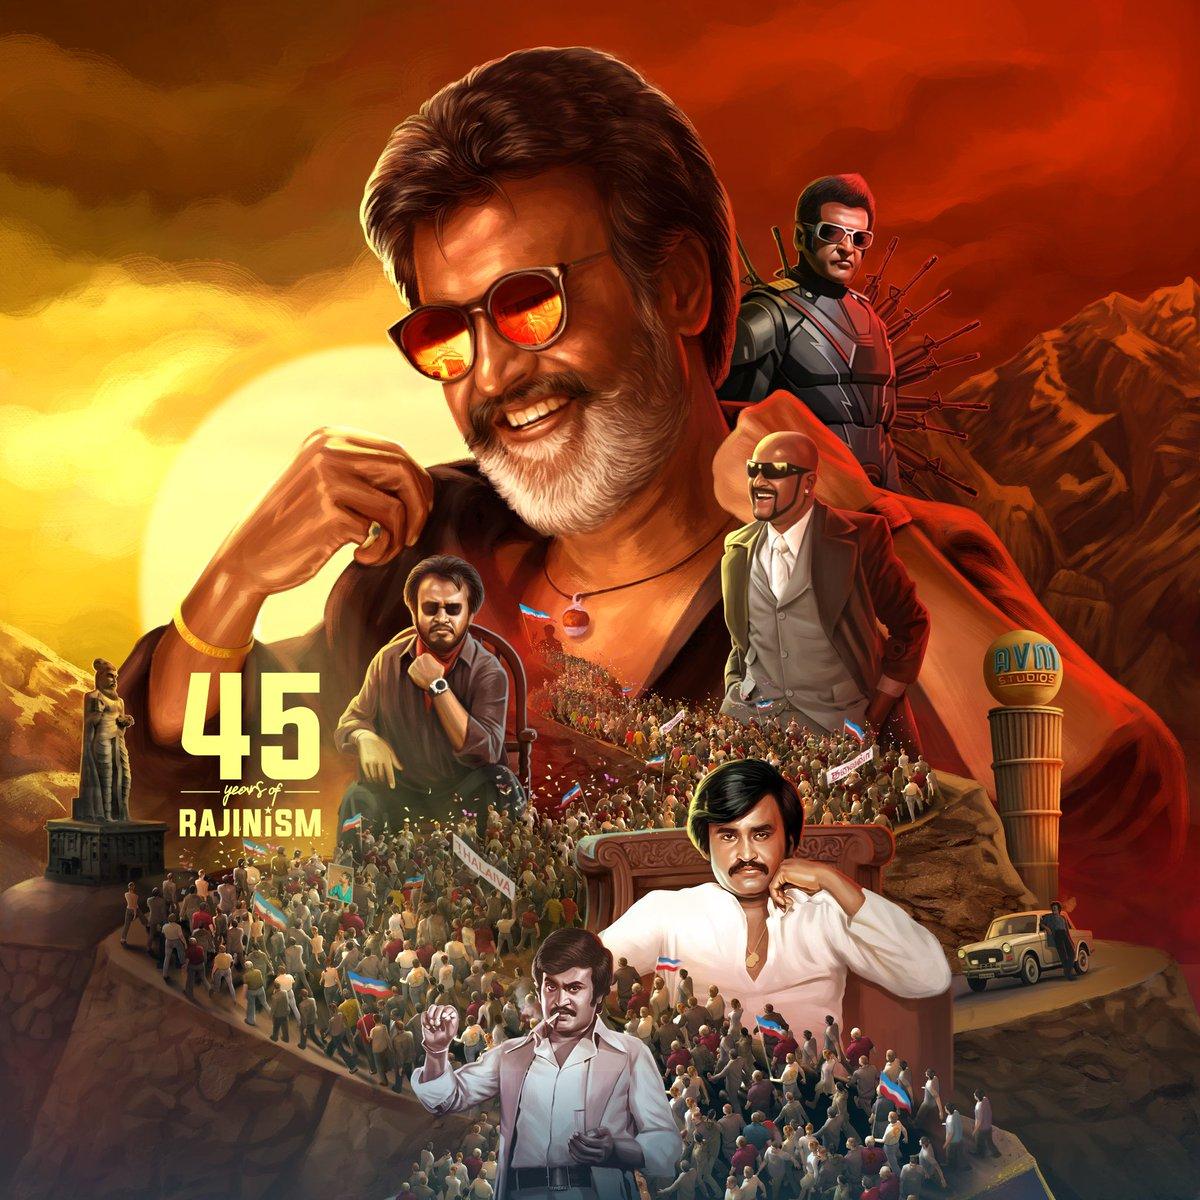 45 Years Of Pure Rajinism.!!   Wishing Him @rajinikanth sir More Years To Celebrate In Cinema ..... Best Wishes On Behalf Of All Thalapathy @actorvijay Fans & our Team @Vaniyambadi_Vmi #45YearsOfRajinismCDP #Masterpic.twitter.com/0pwusuH75p